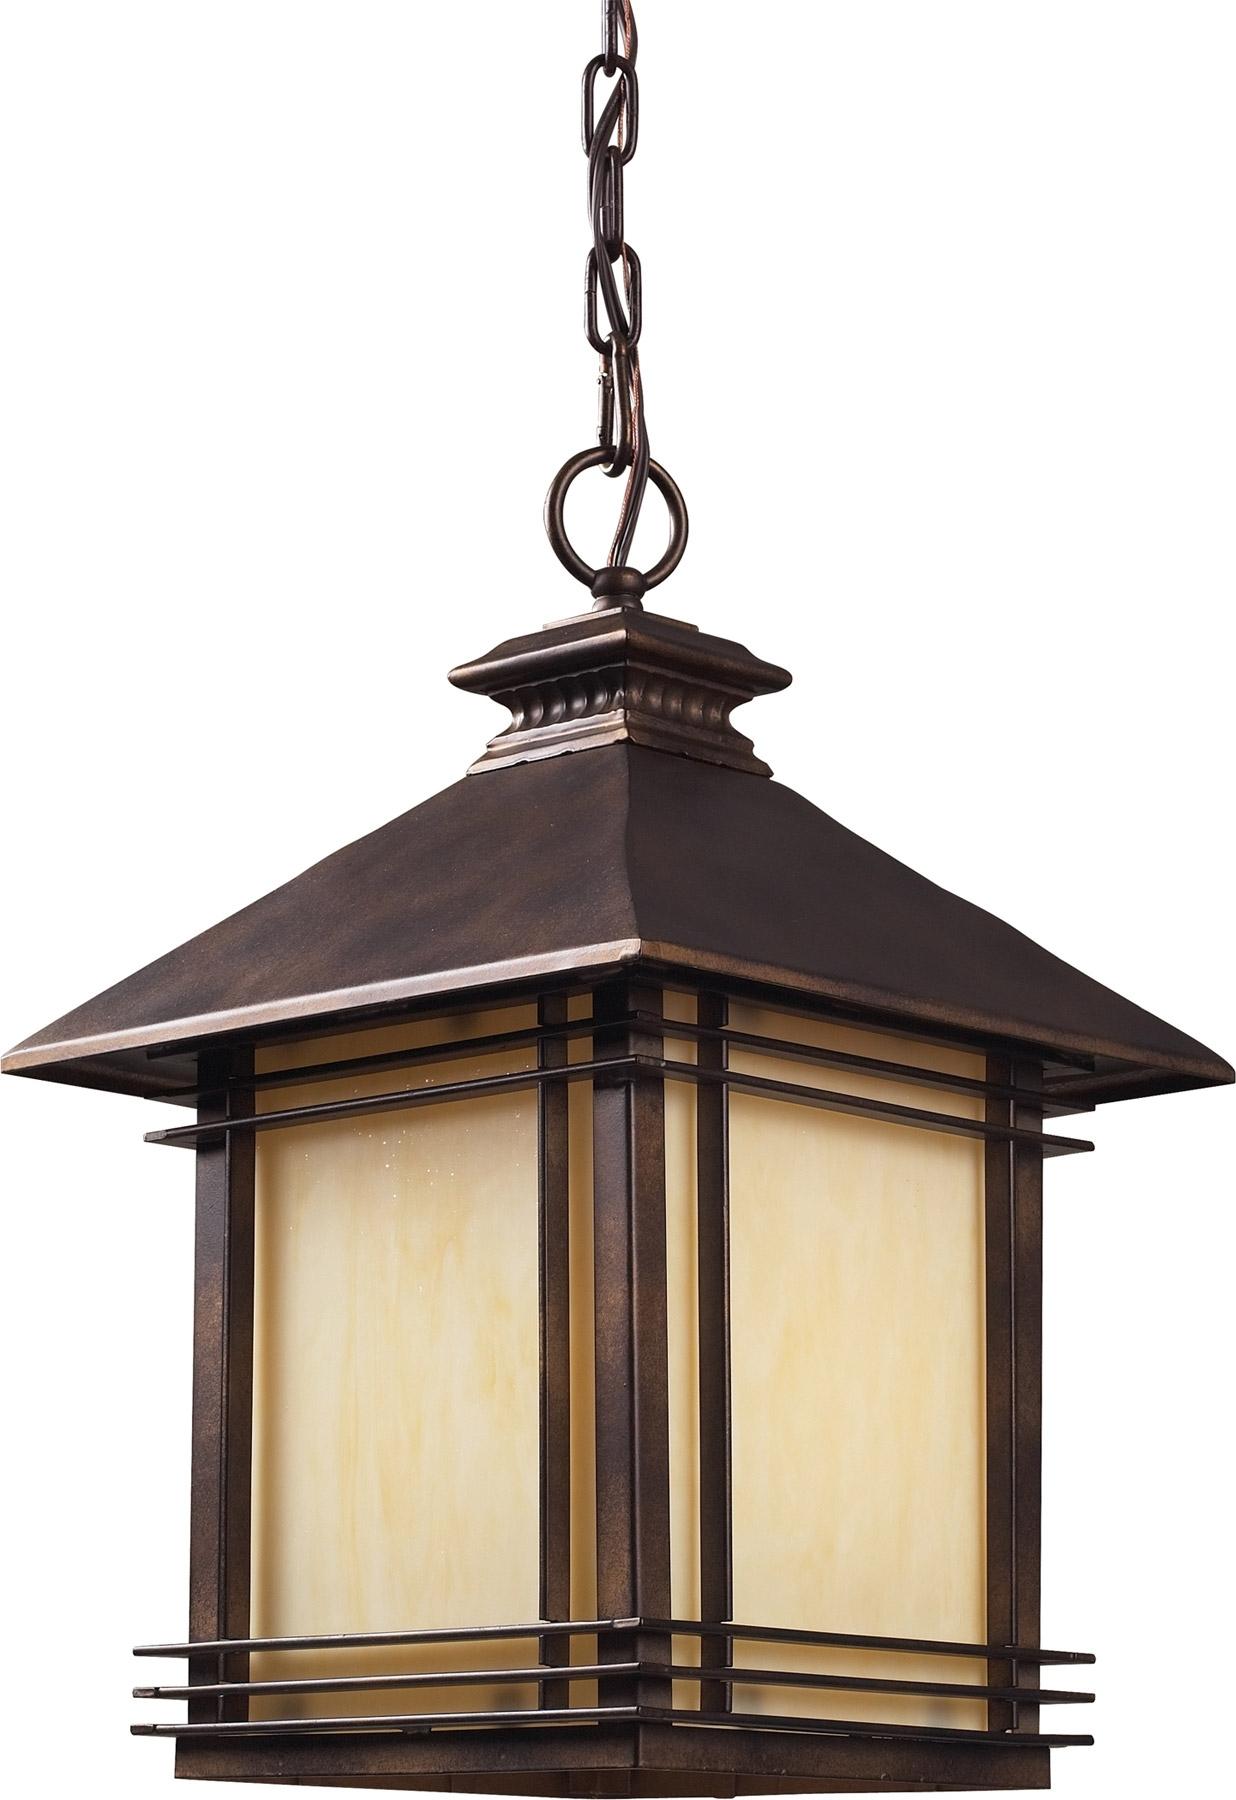 Lighting 42103/1 Blackwell Outdoor Hanging Lantern With Regard To Outdoor Hanging Lantern Lights (View 5 of 15)